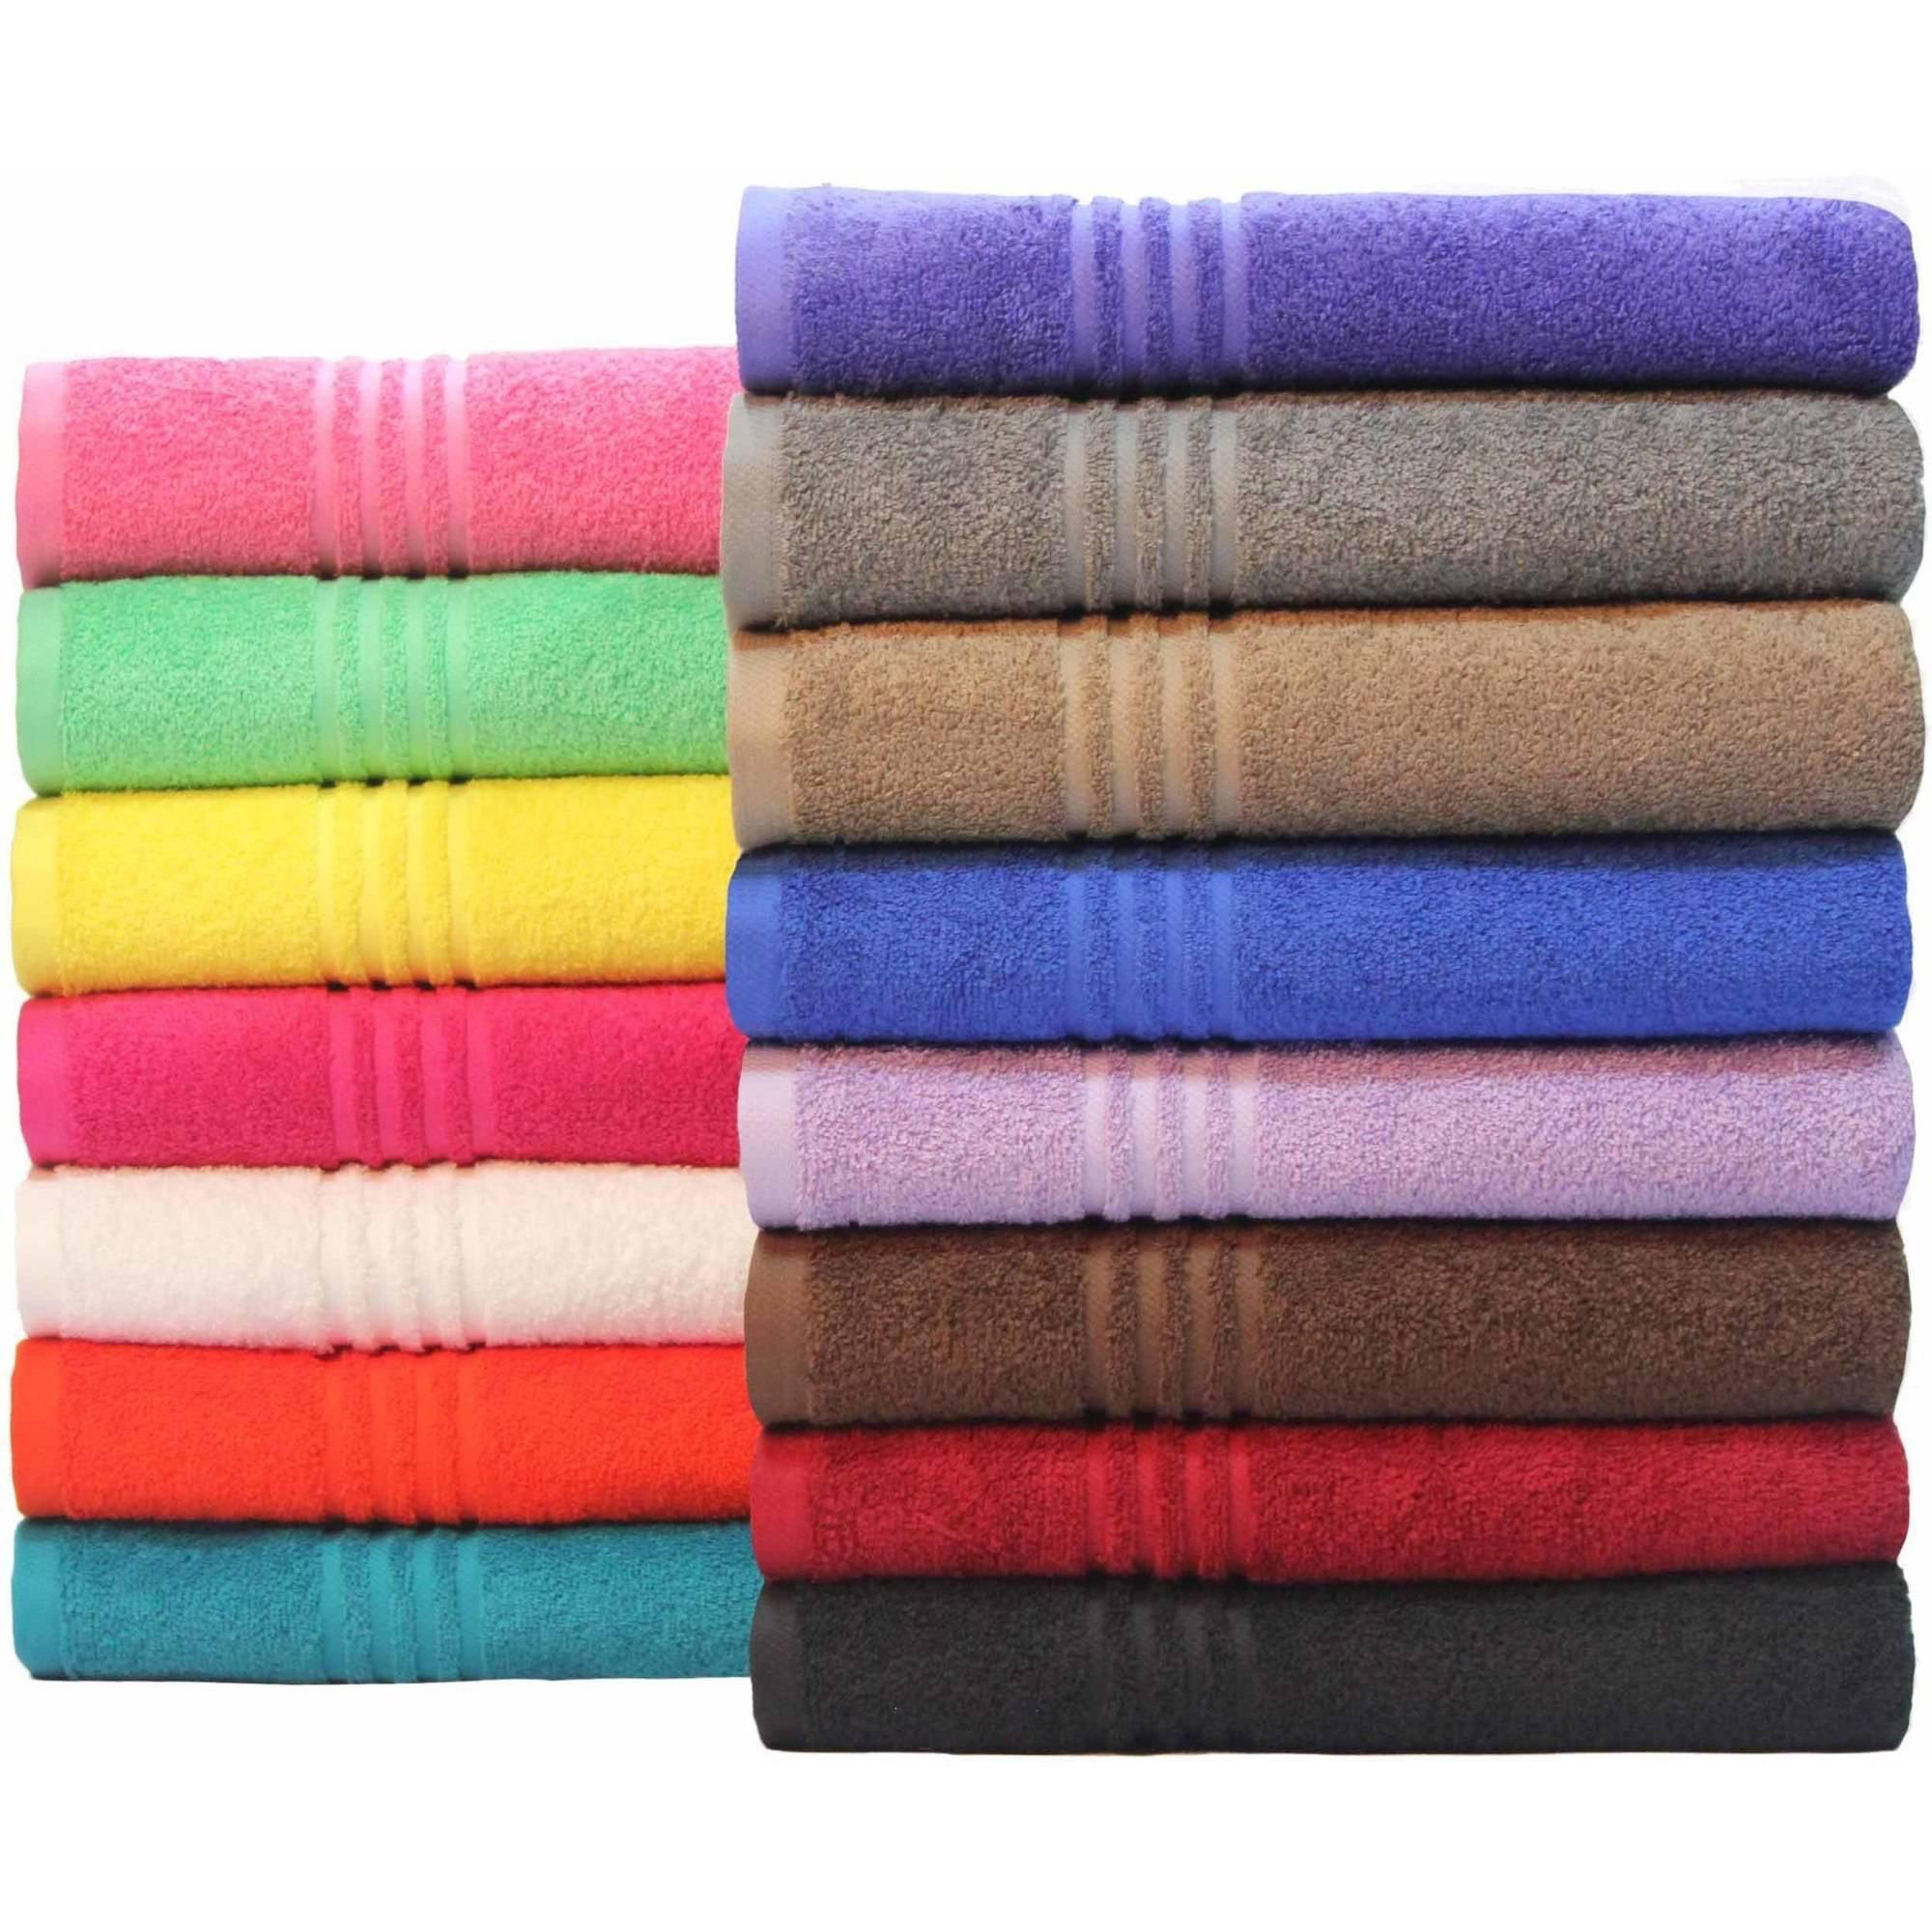 Mainstays Essential True Colors Bath Towel Collection